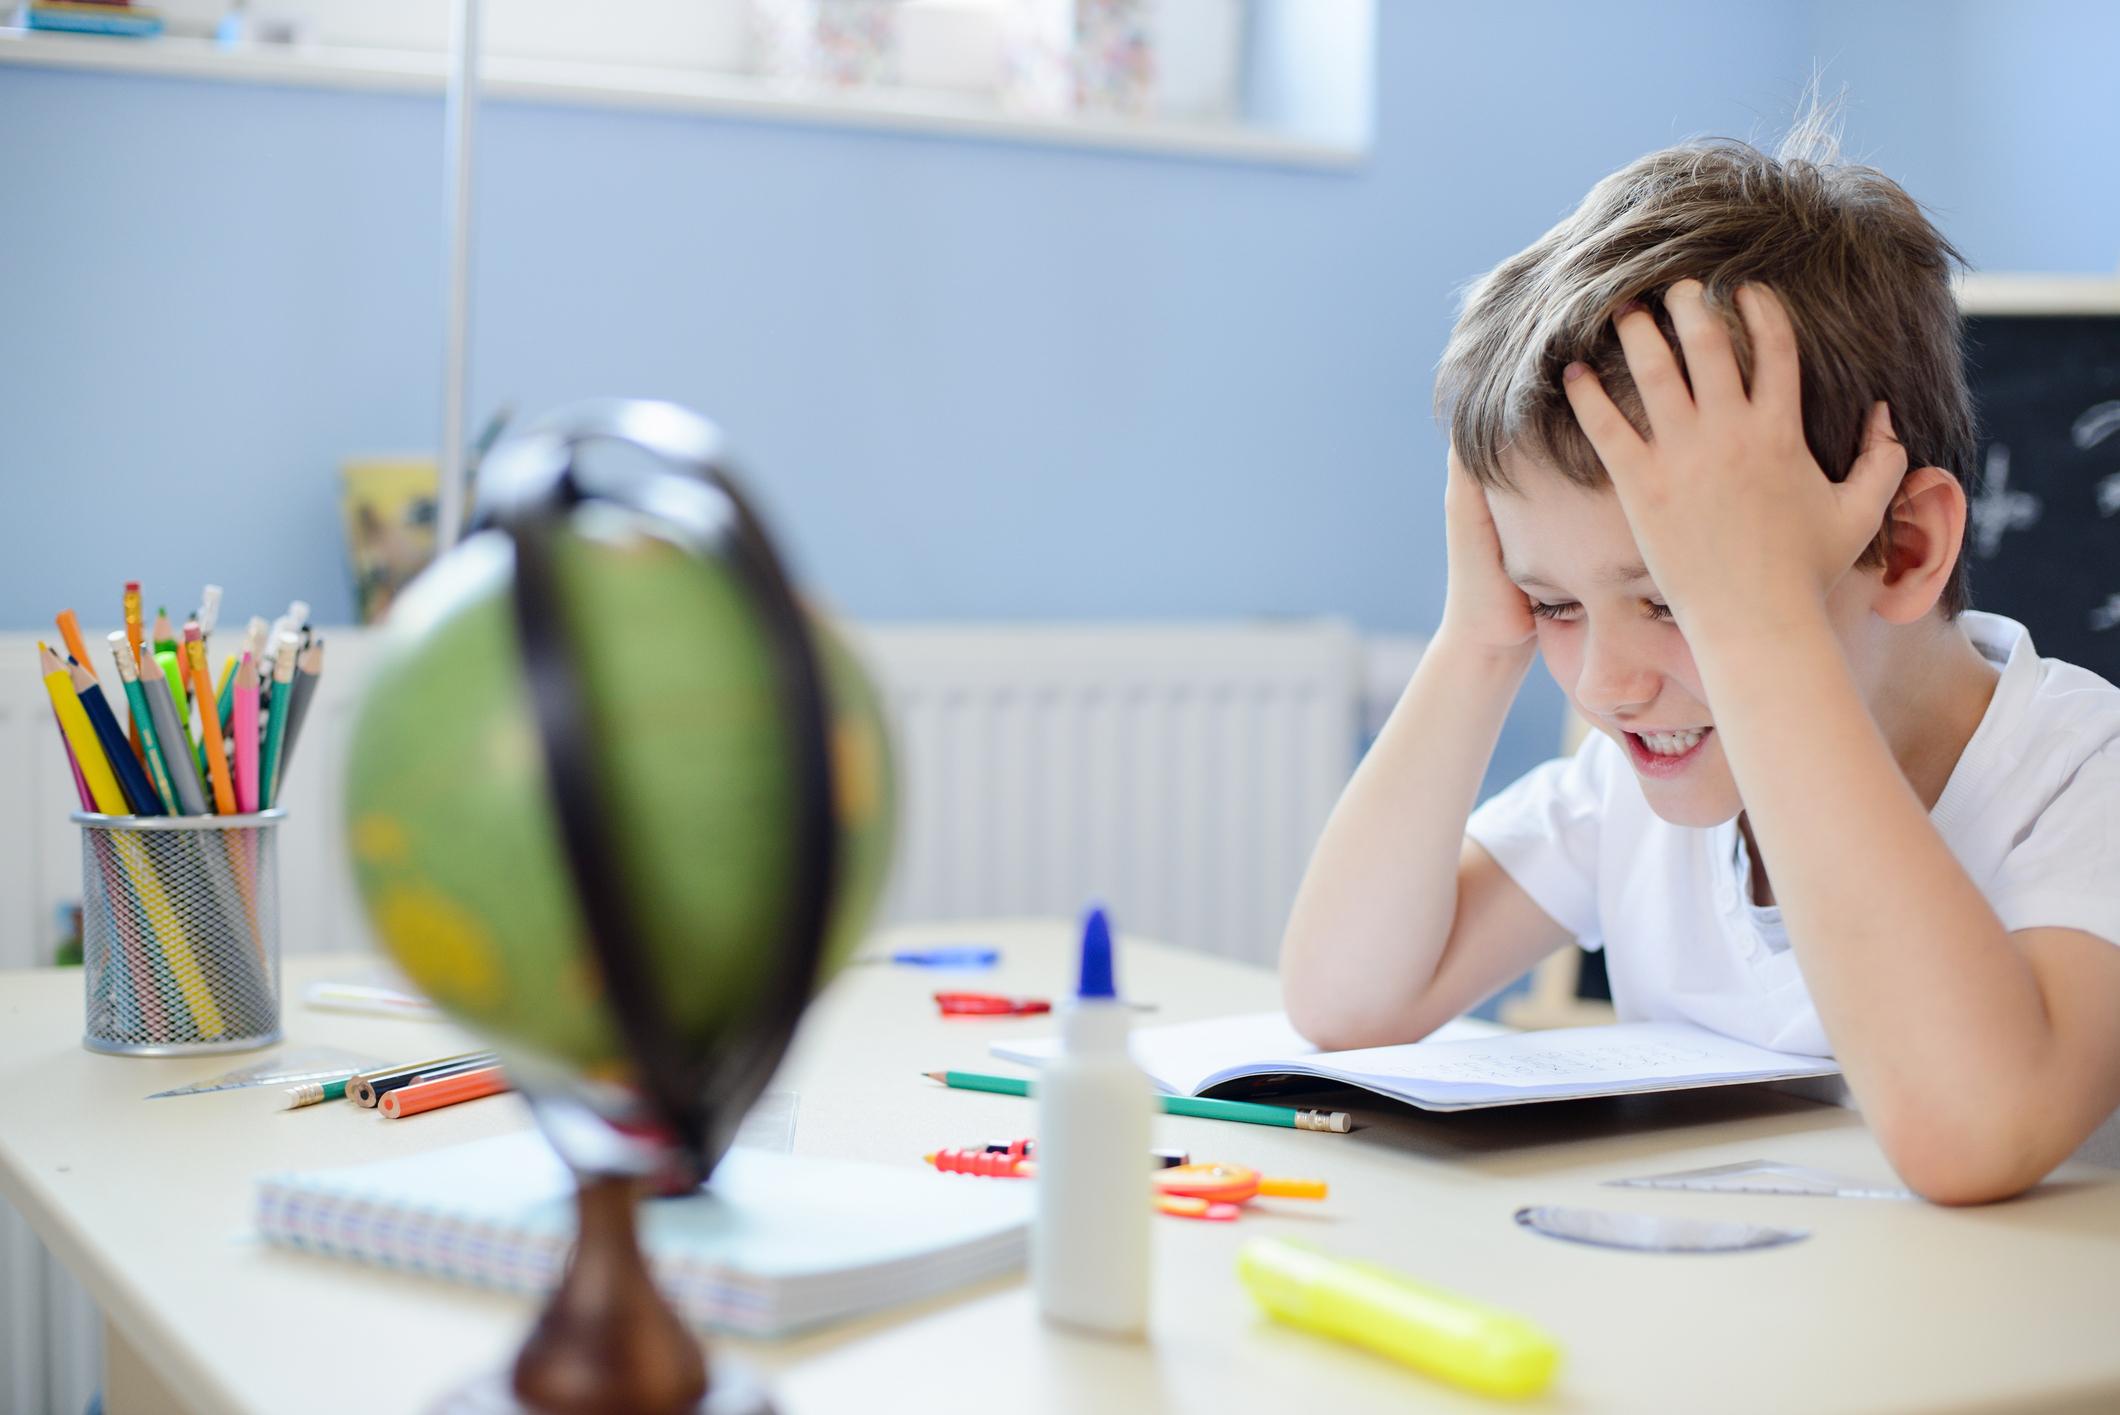 Child entrepreneur: first game steps